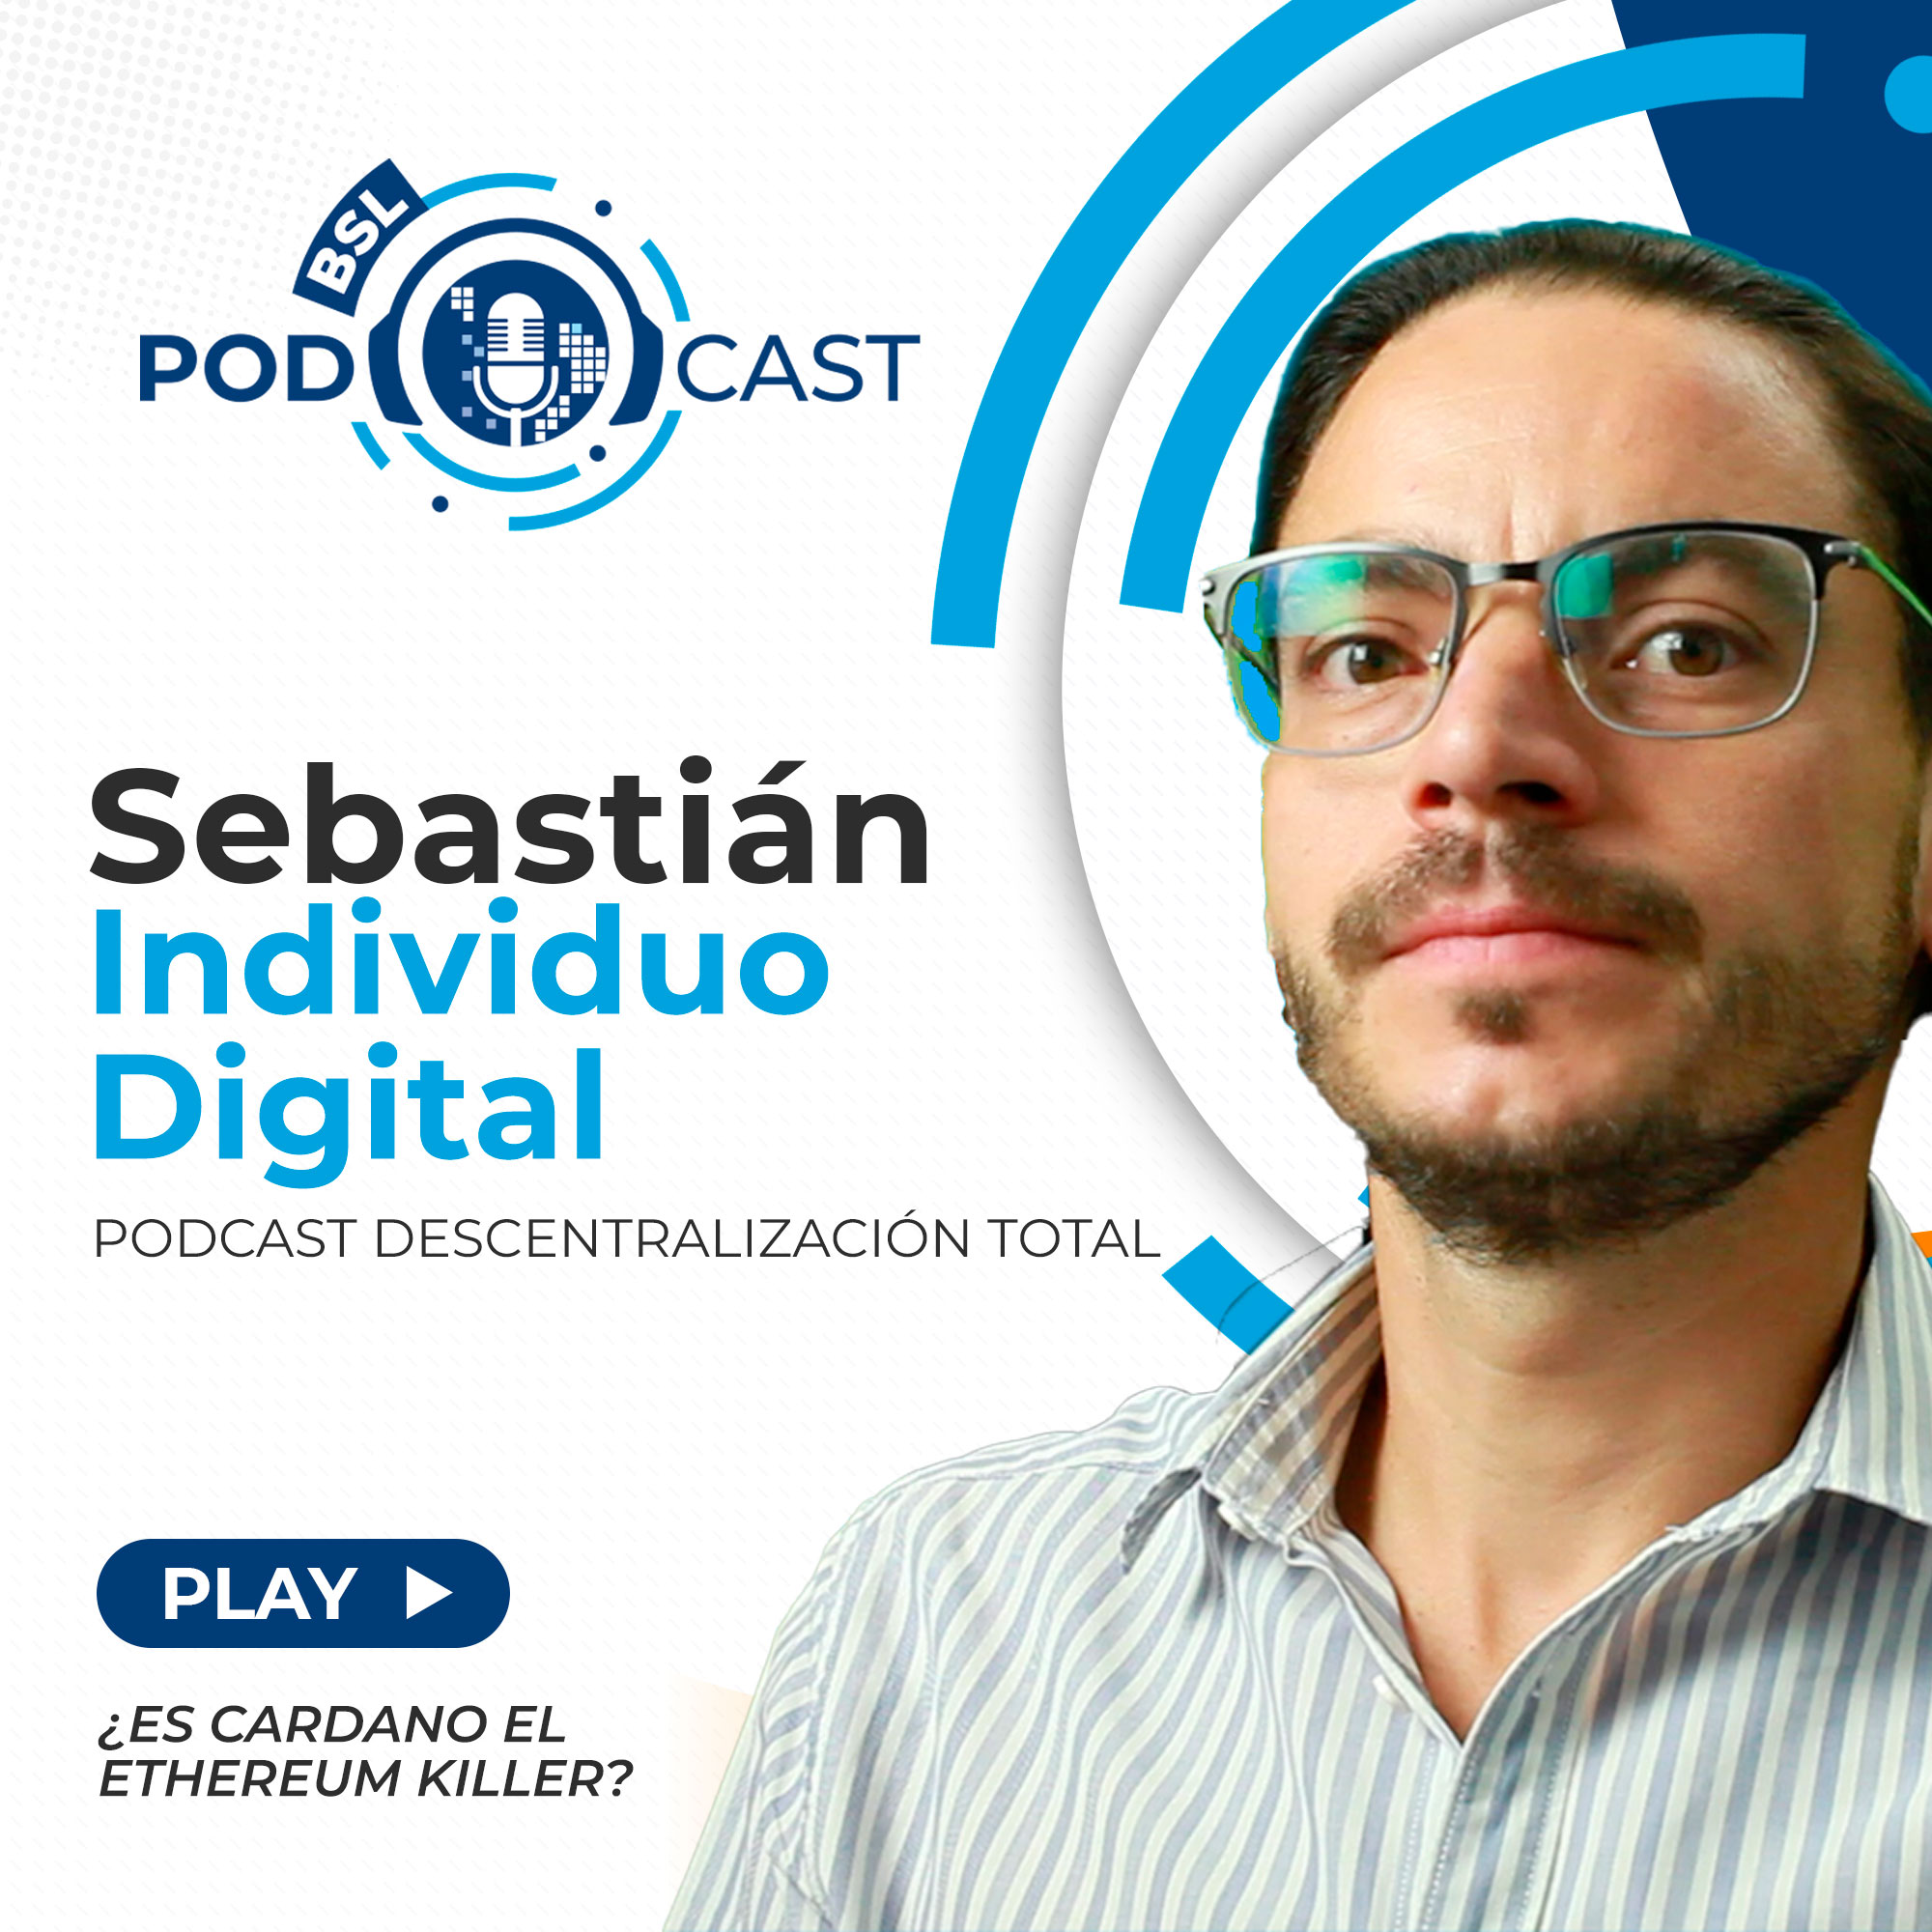 bsl podcast individuo digital cardano